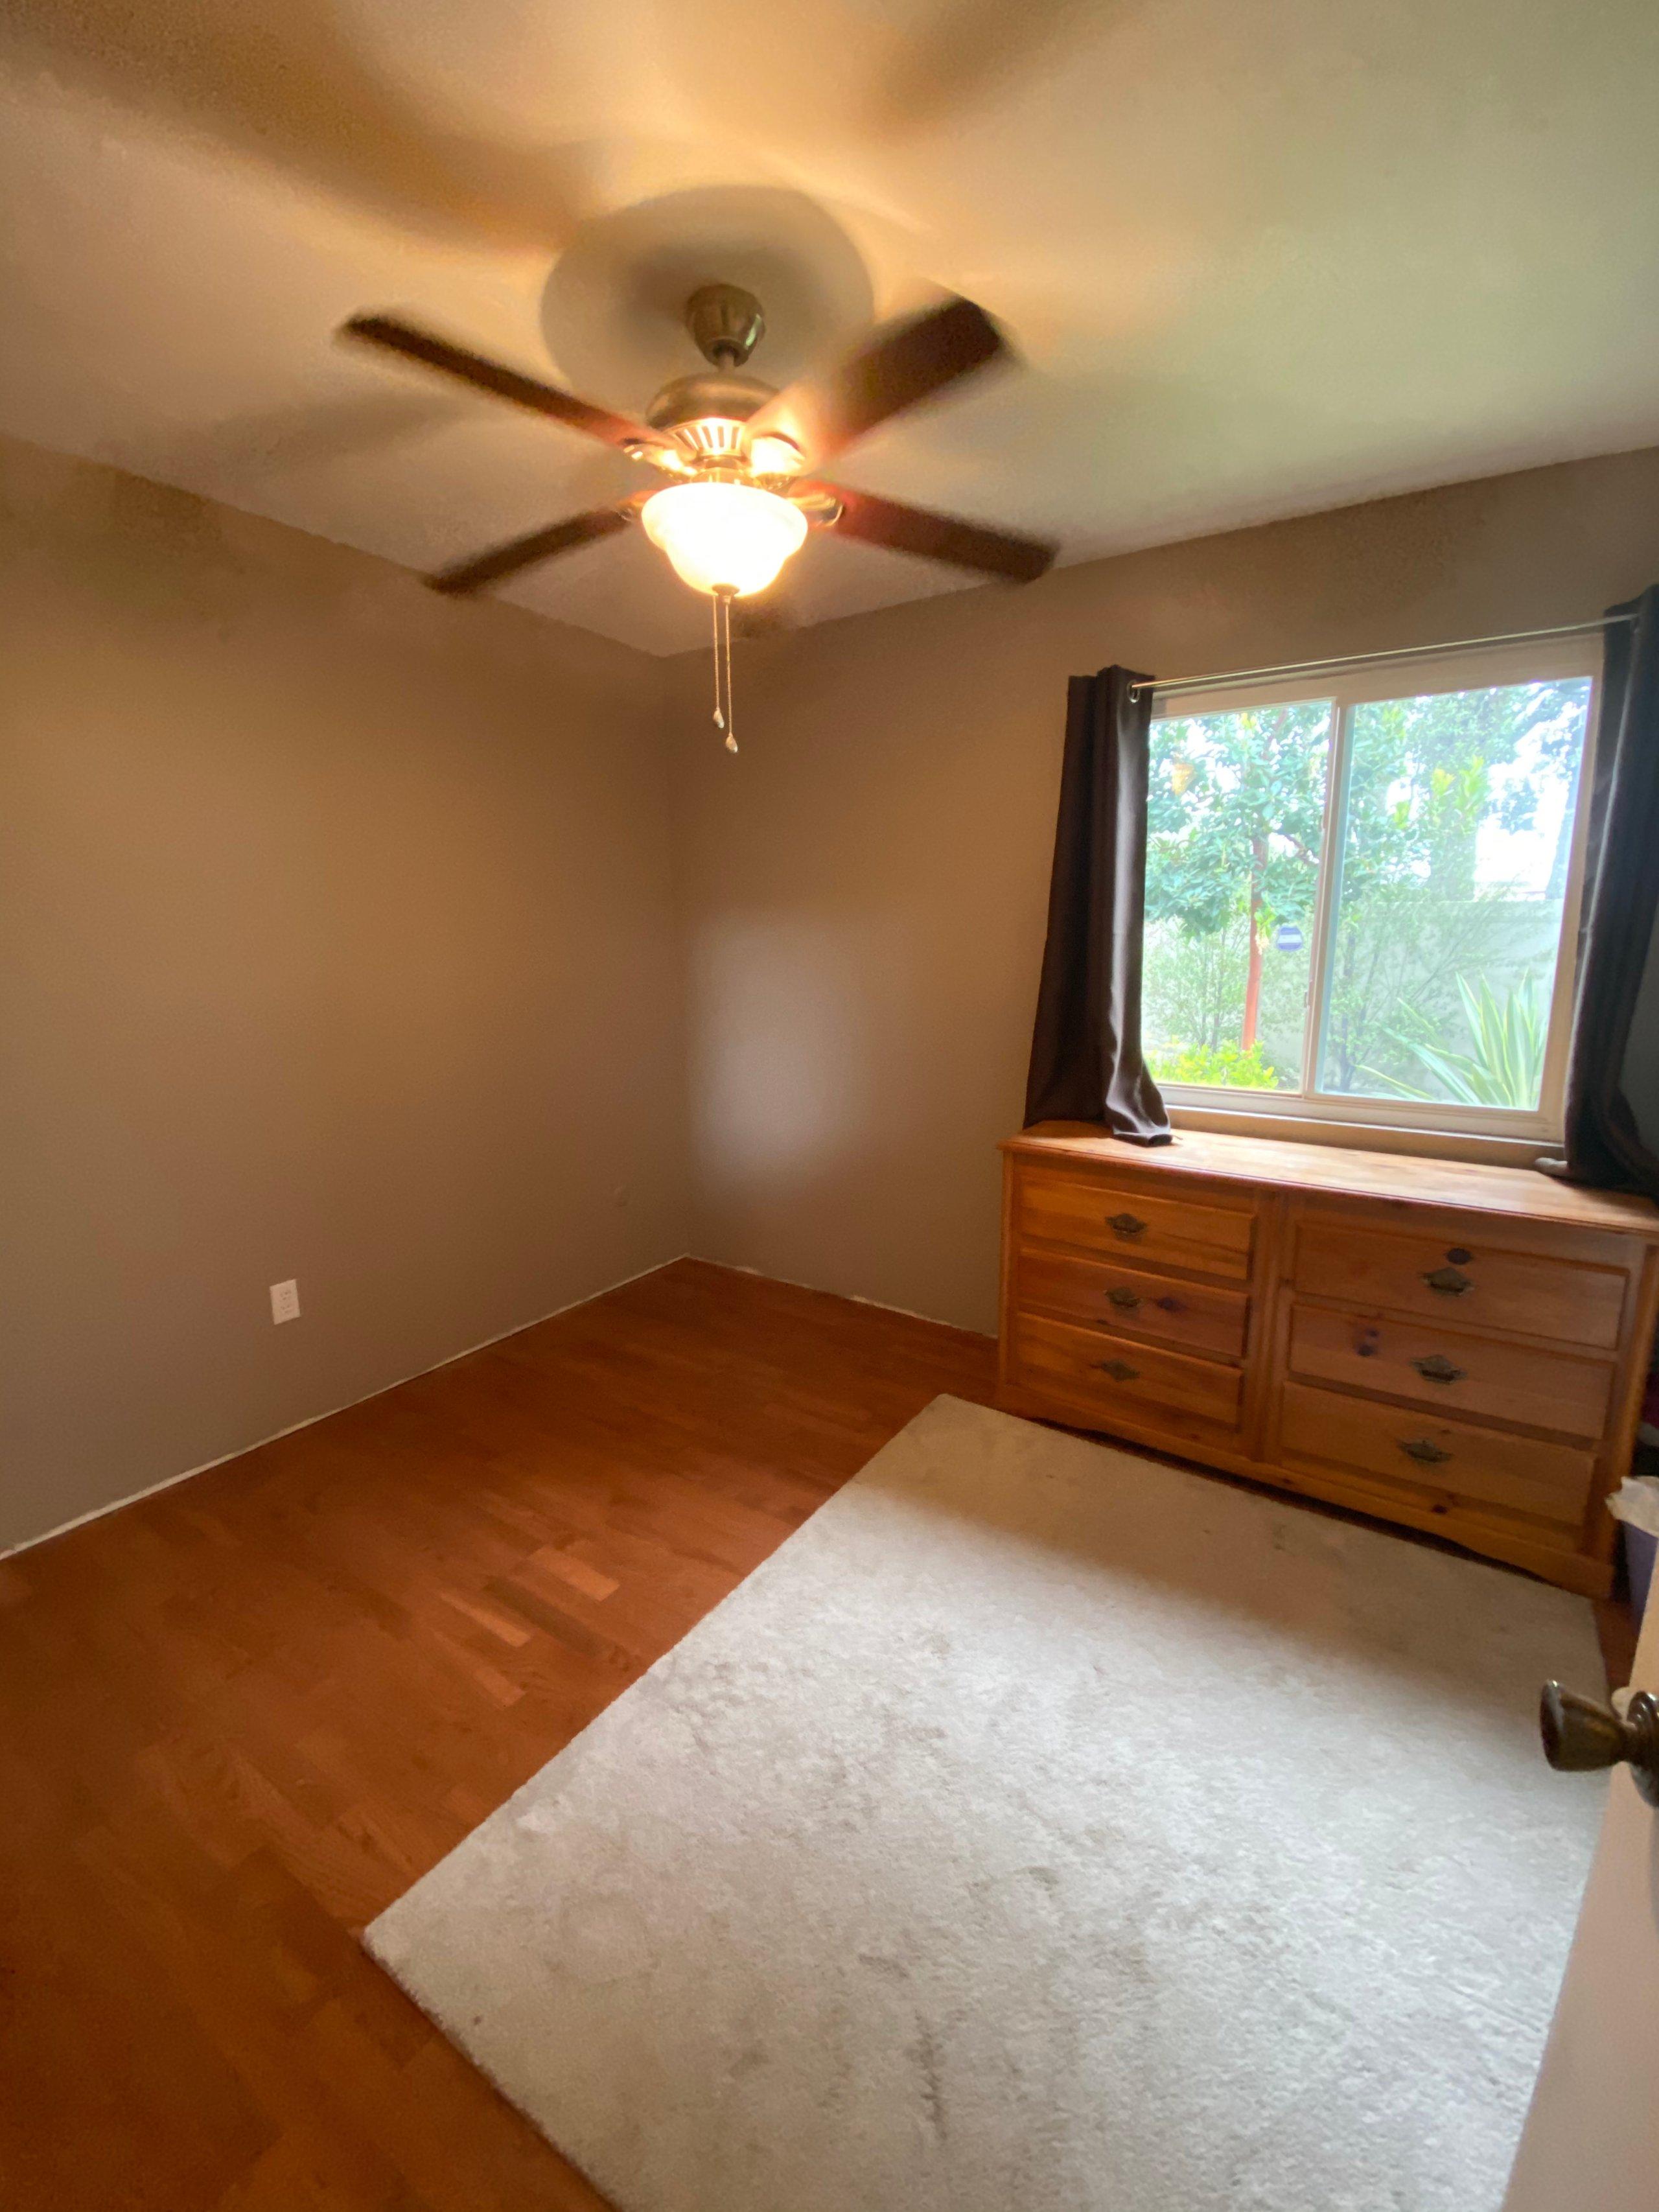 10x9 Bedroom self storage unit